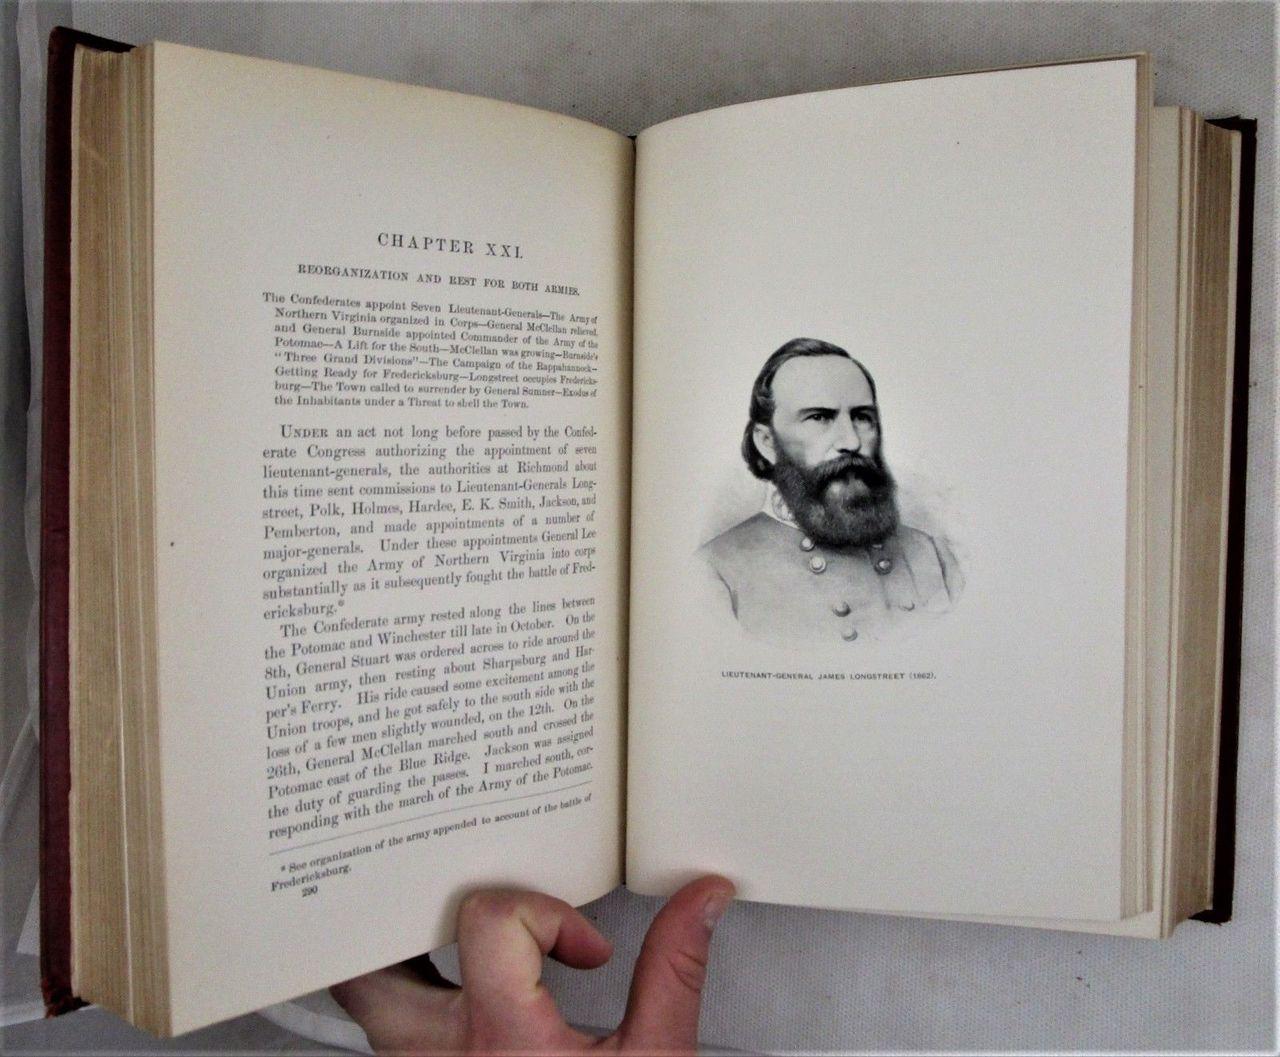 FROM MANASSAS TO APPOMATTOX, James Longstreet - 1896 [1st Ed]